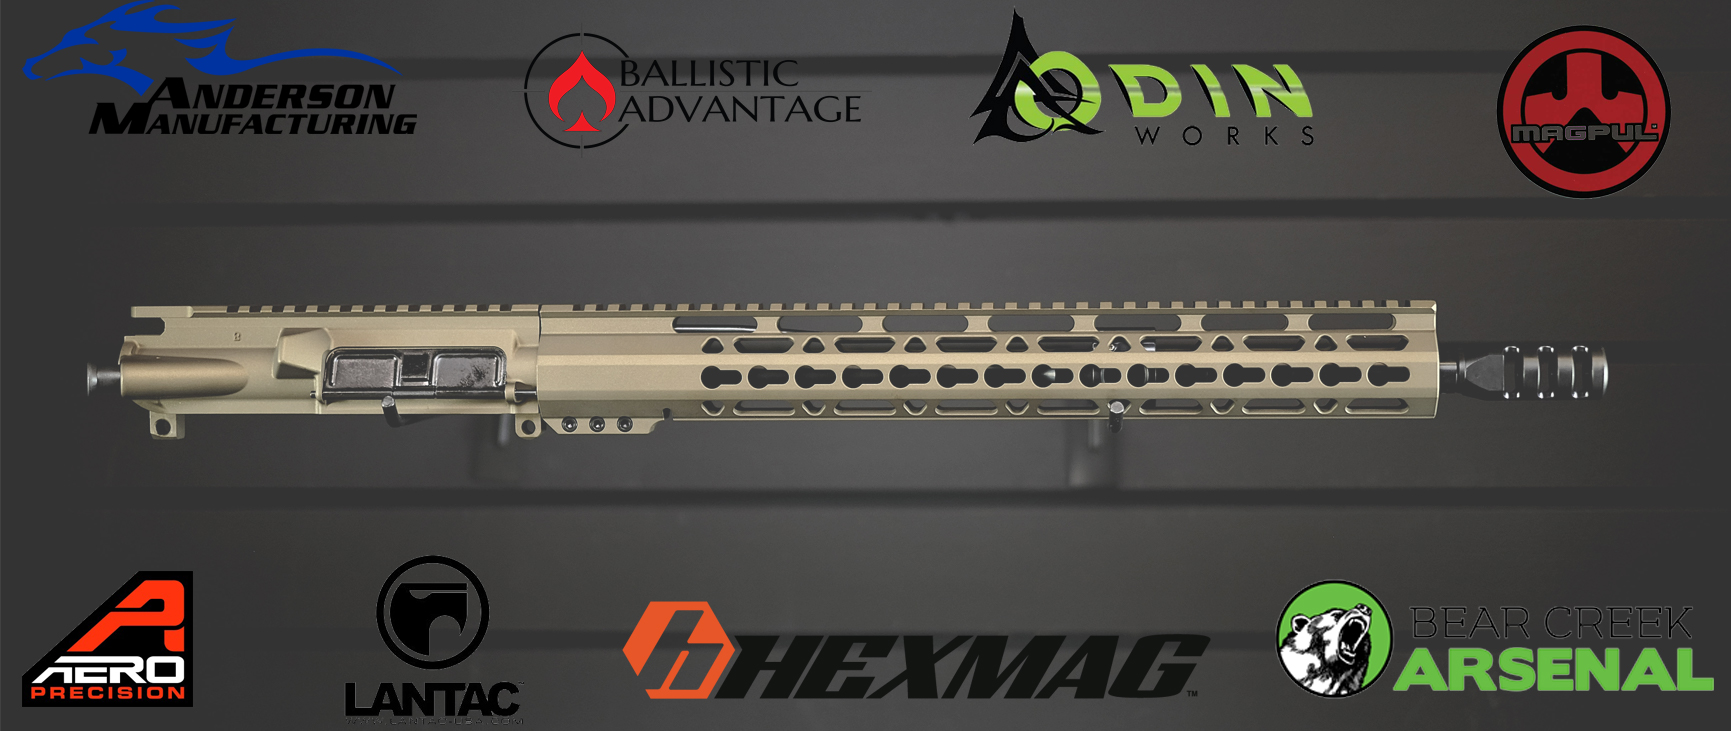 AR 15 Parts | Black Rifle Depot